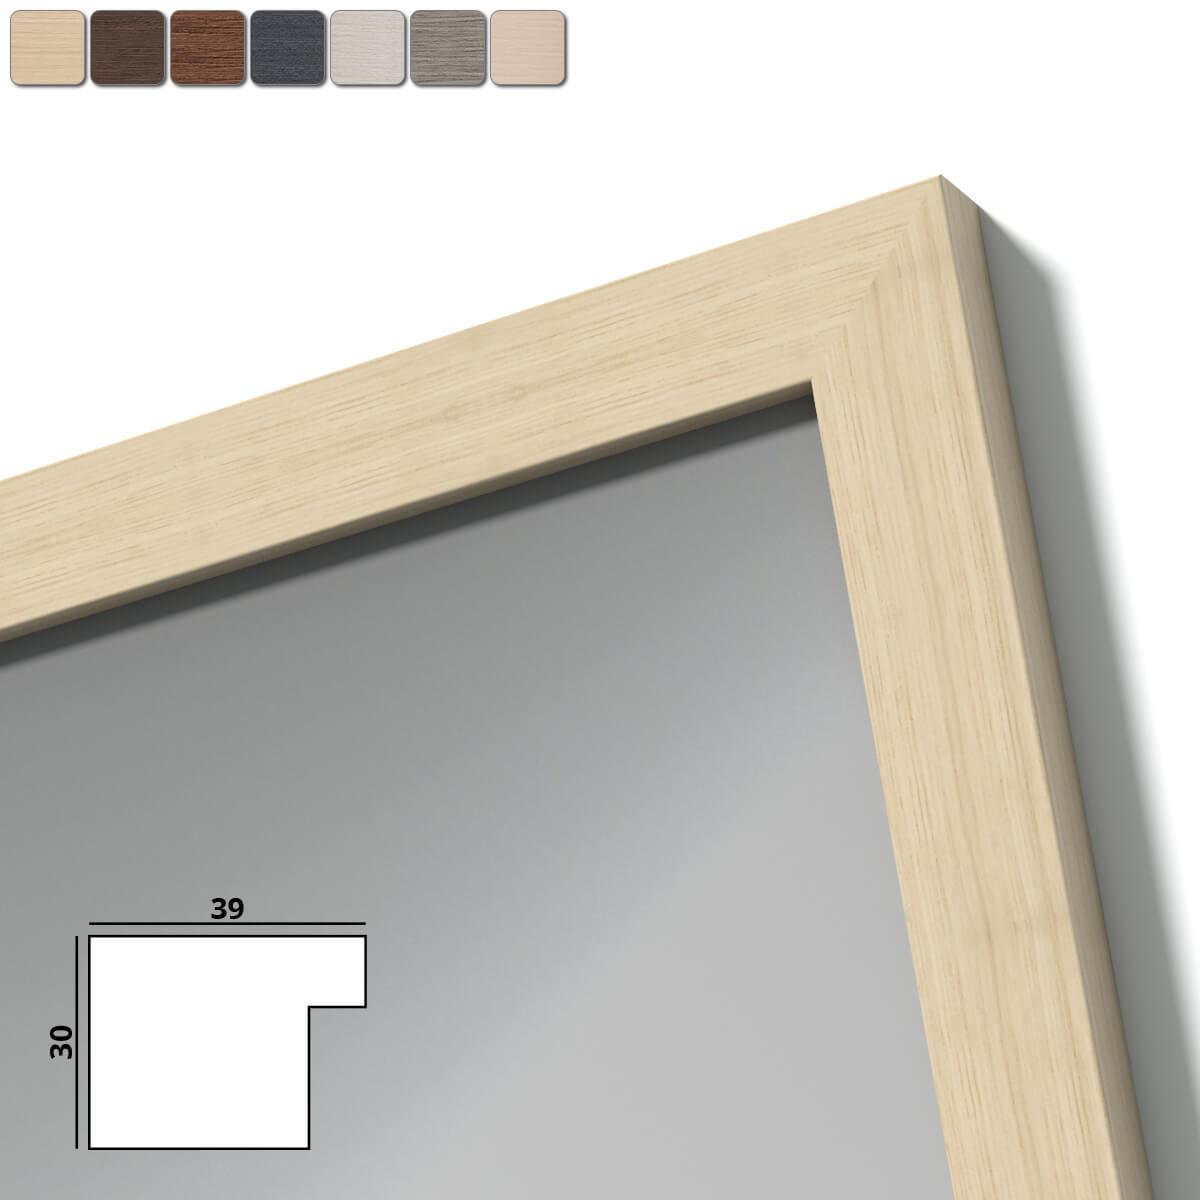 spiegel mit holzrahmen nach ma loire 989709717. Black Bedroom Furniture Sets. Home Design Ideas